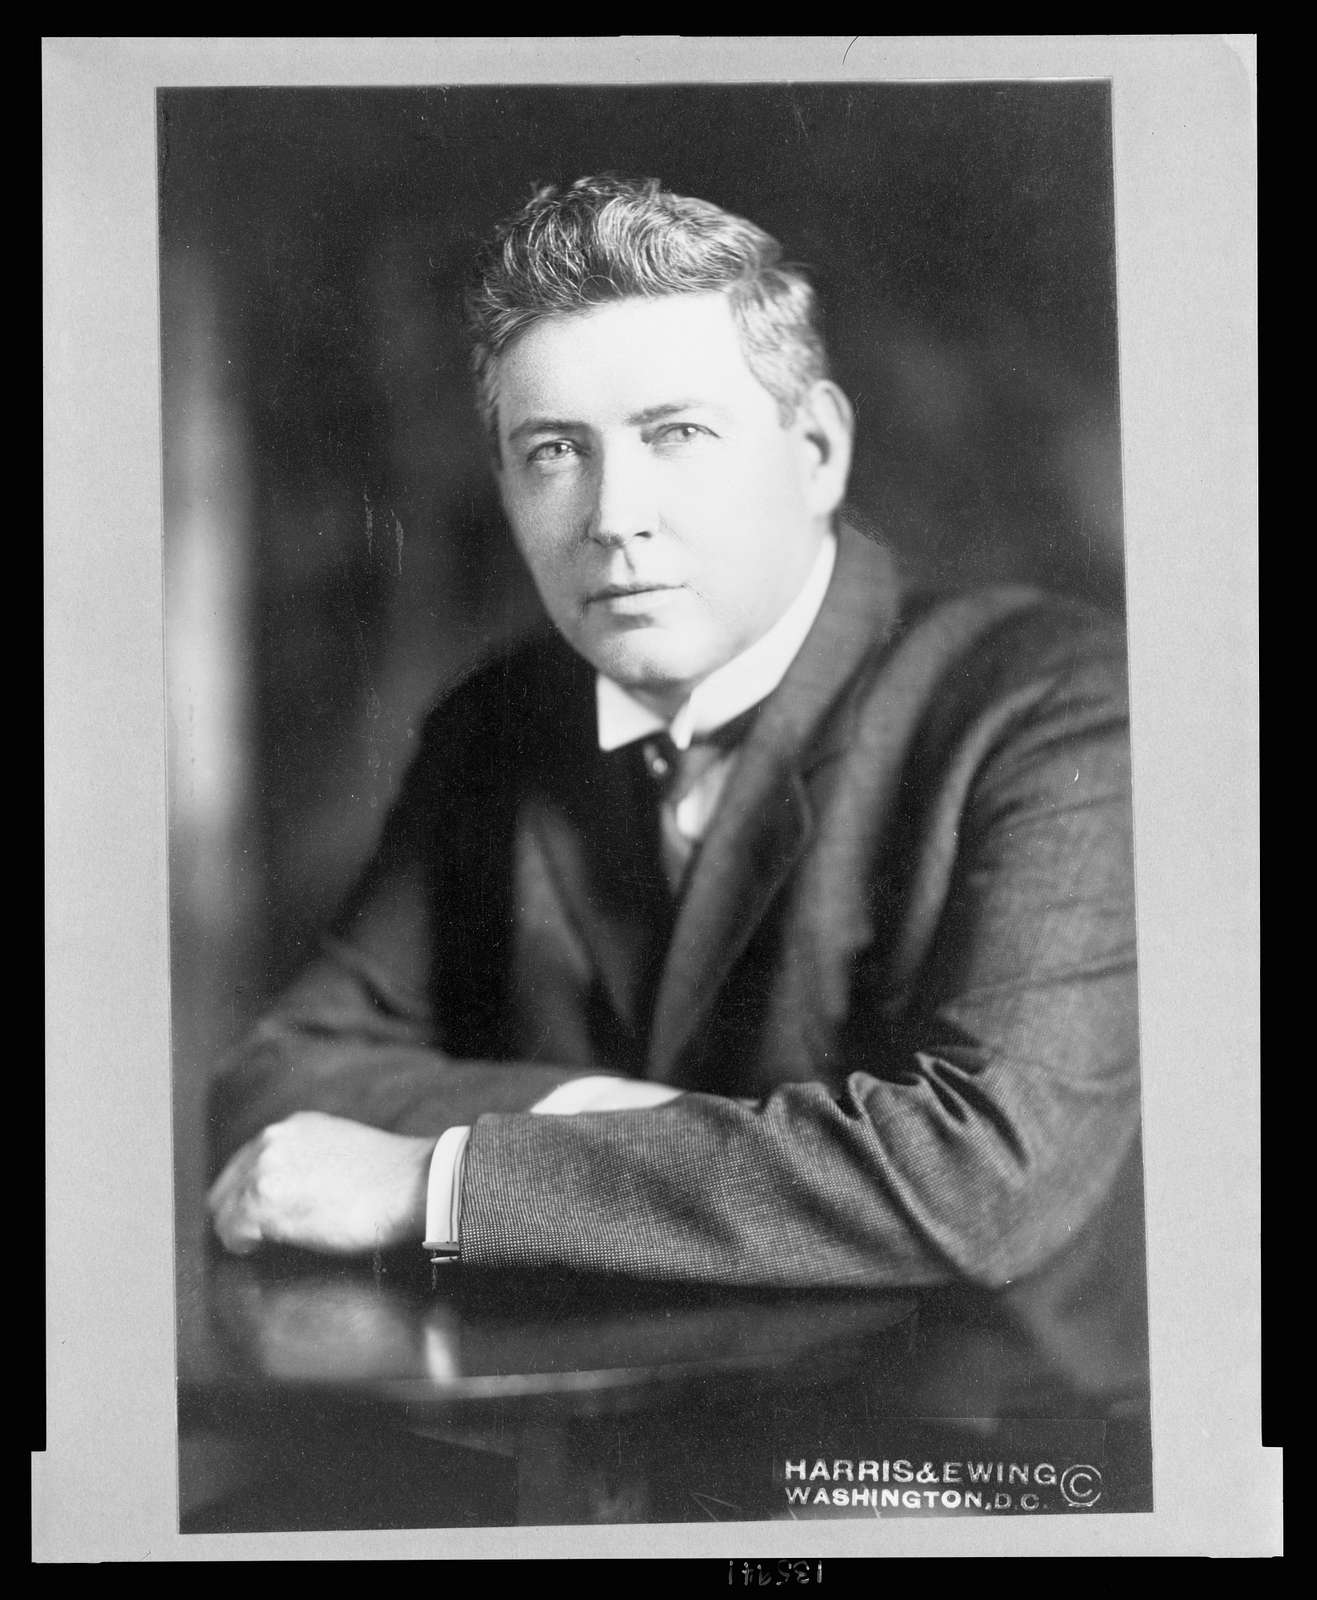 [Rep. Nicholas John Sinnott, Republican from Oregon, half-length studio portrait, seated, facing slightly left]